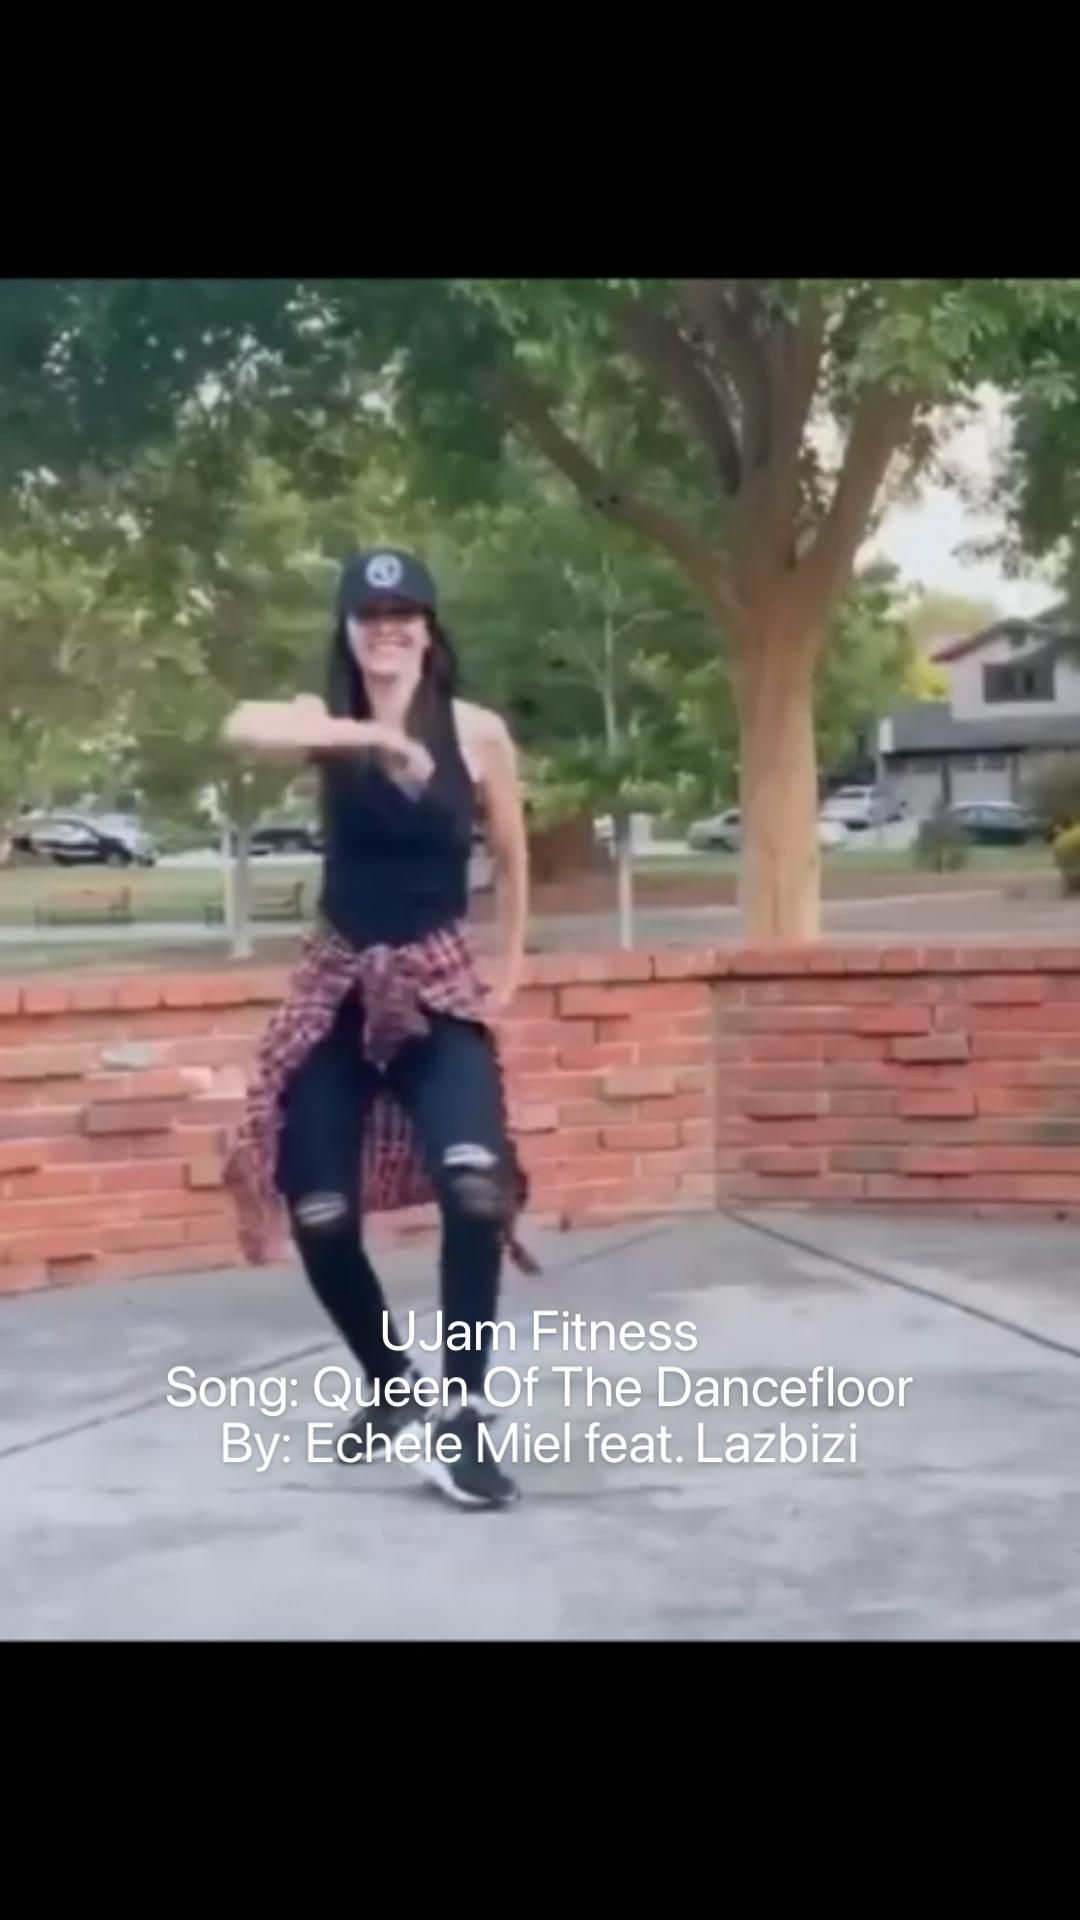 Dance Fitness Ujam An Immersive Guide By Simplybeautifulbyhila